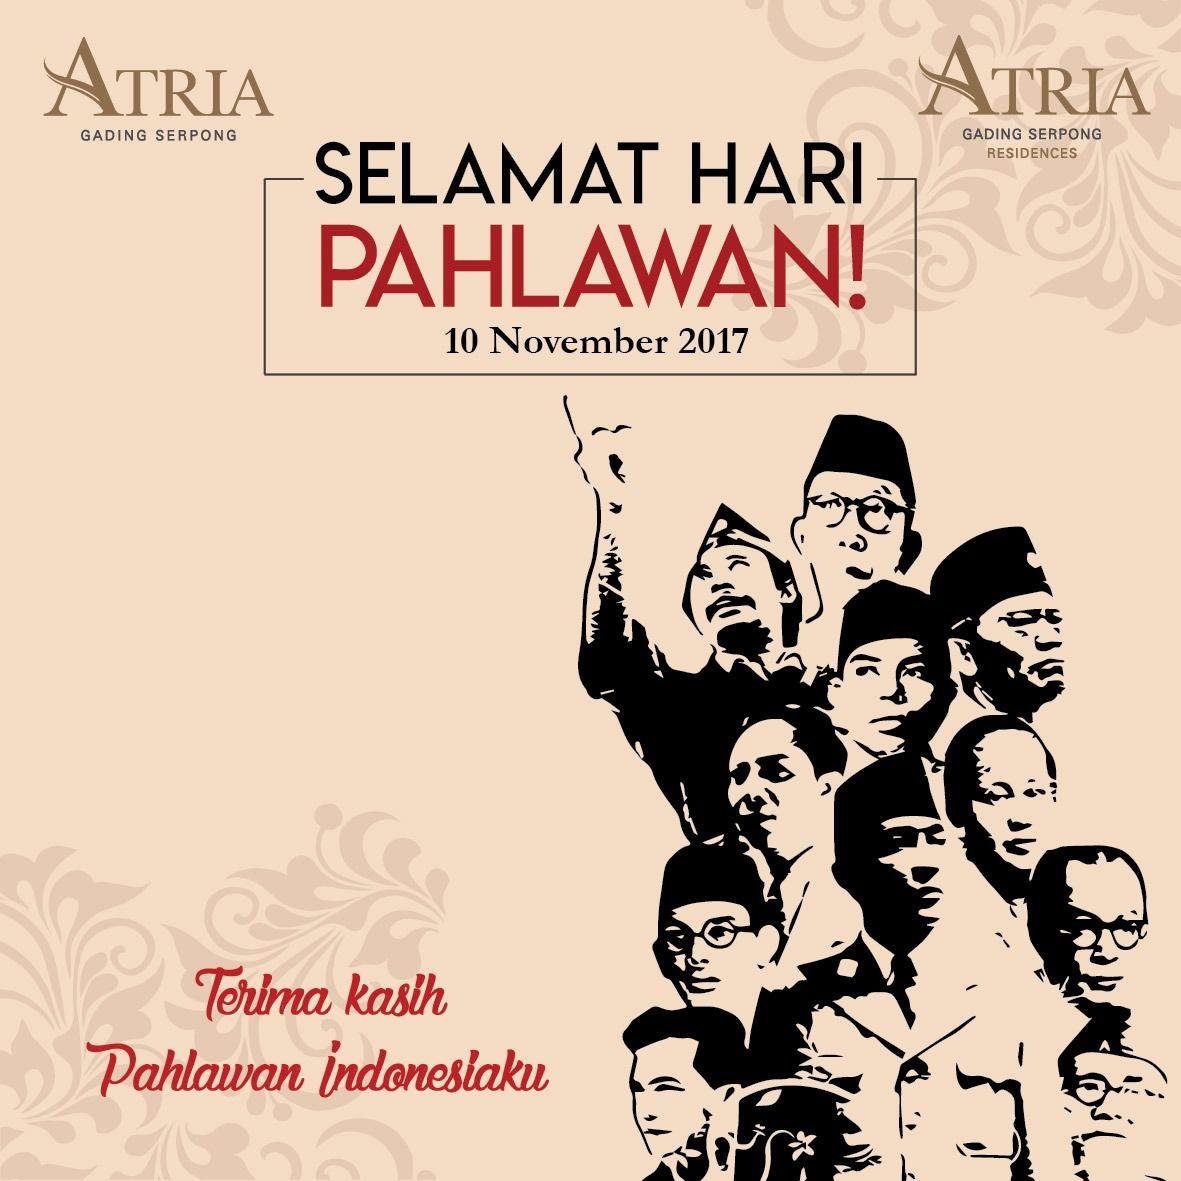 Gambar Pahlawan Indonesia Kartun